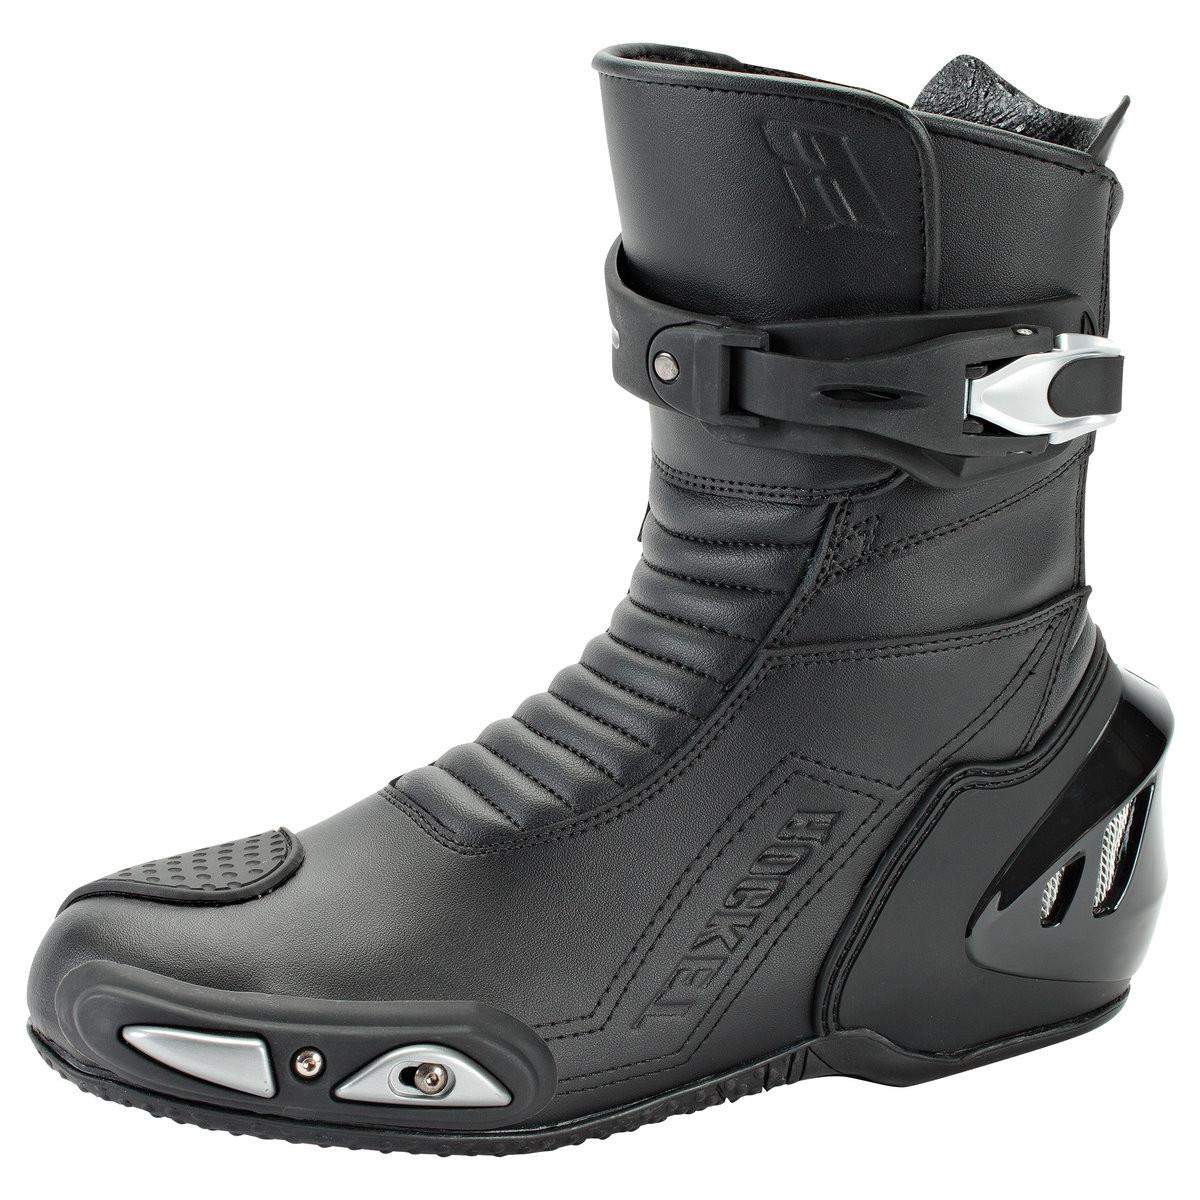 9aaba51ca7b Joe Rocket Super Street RX14 Boots